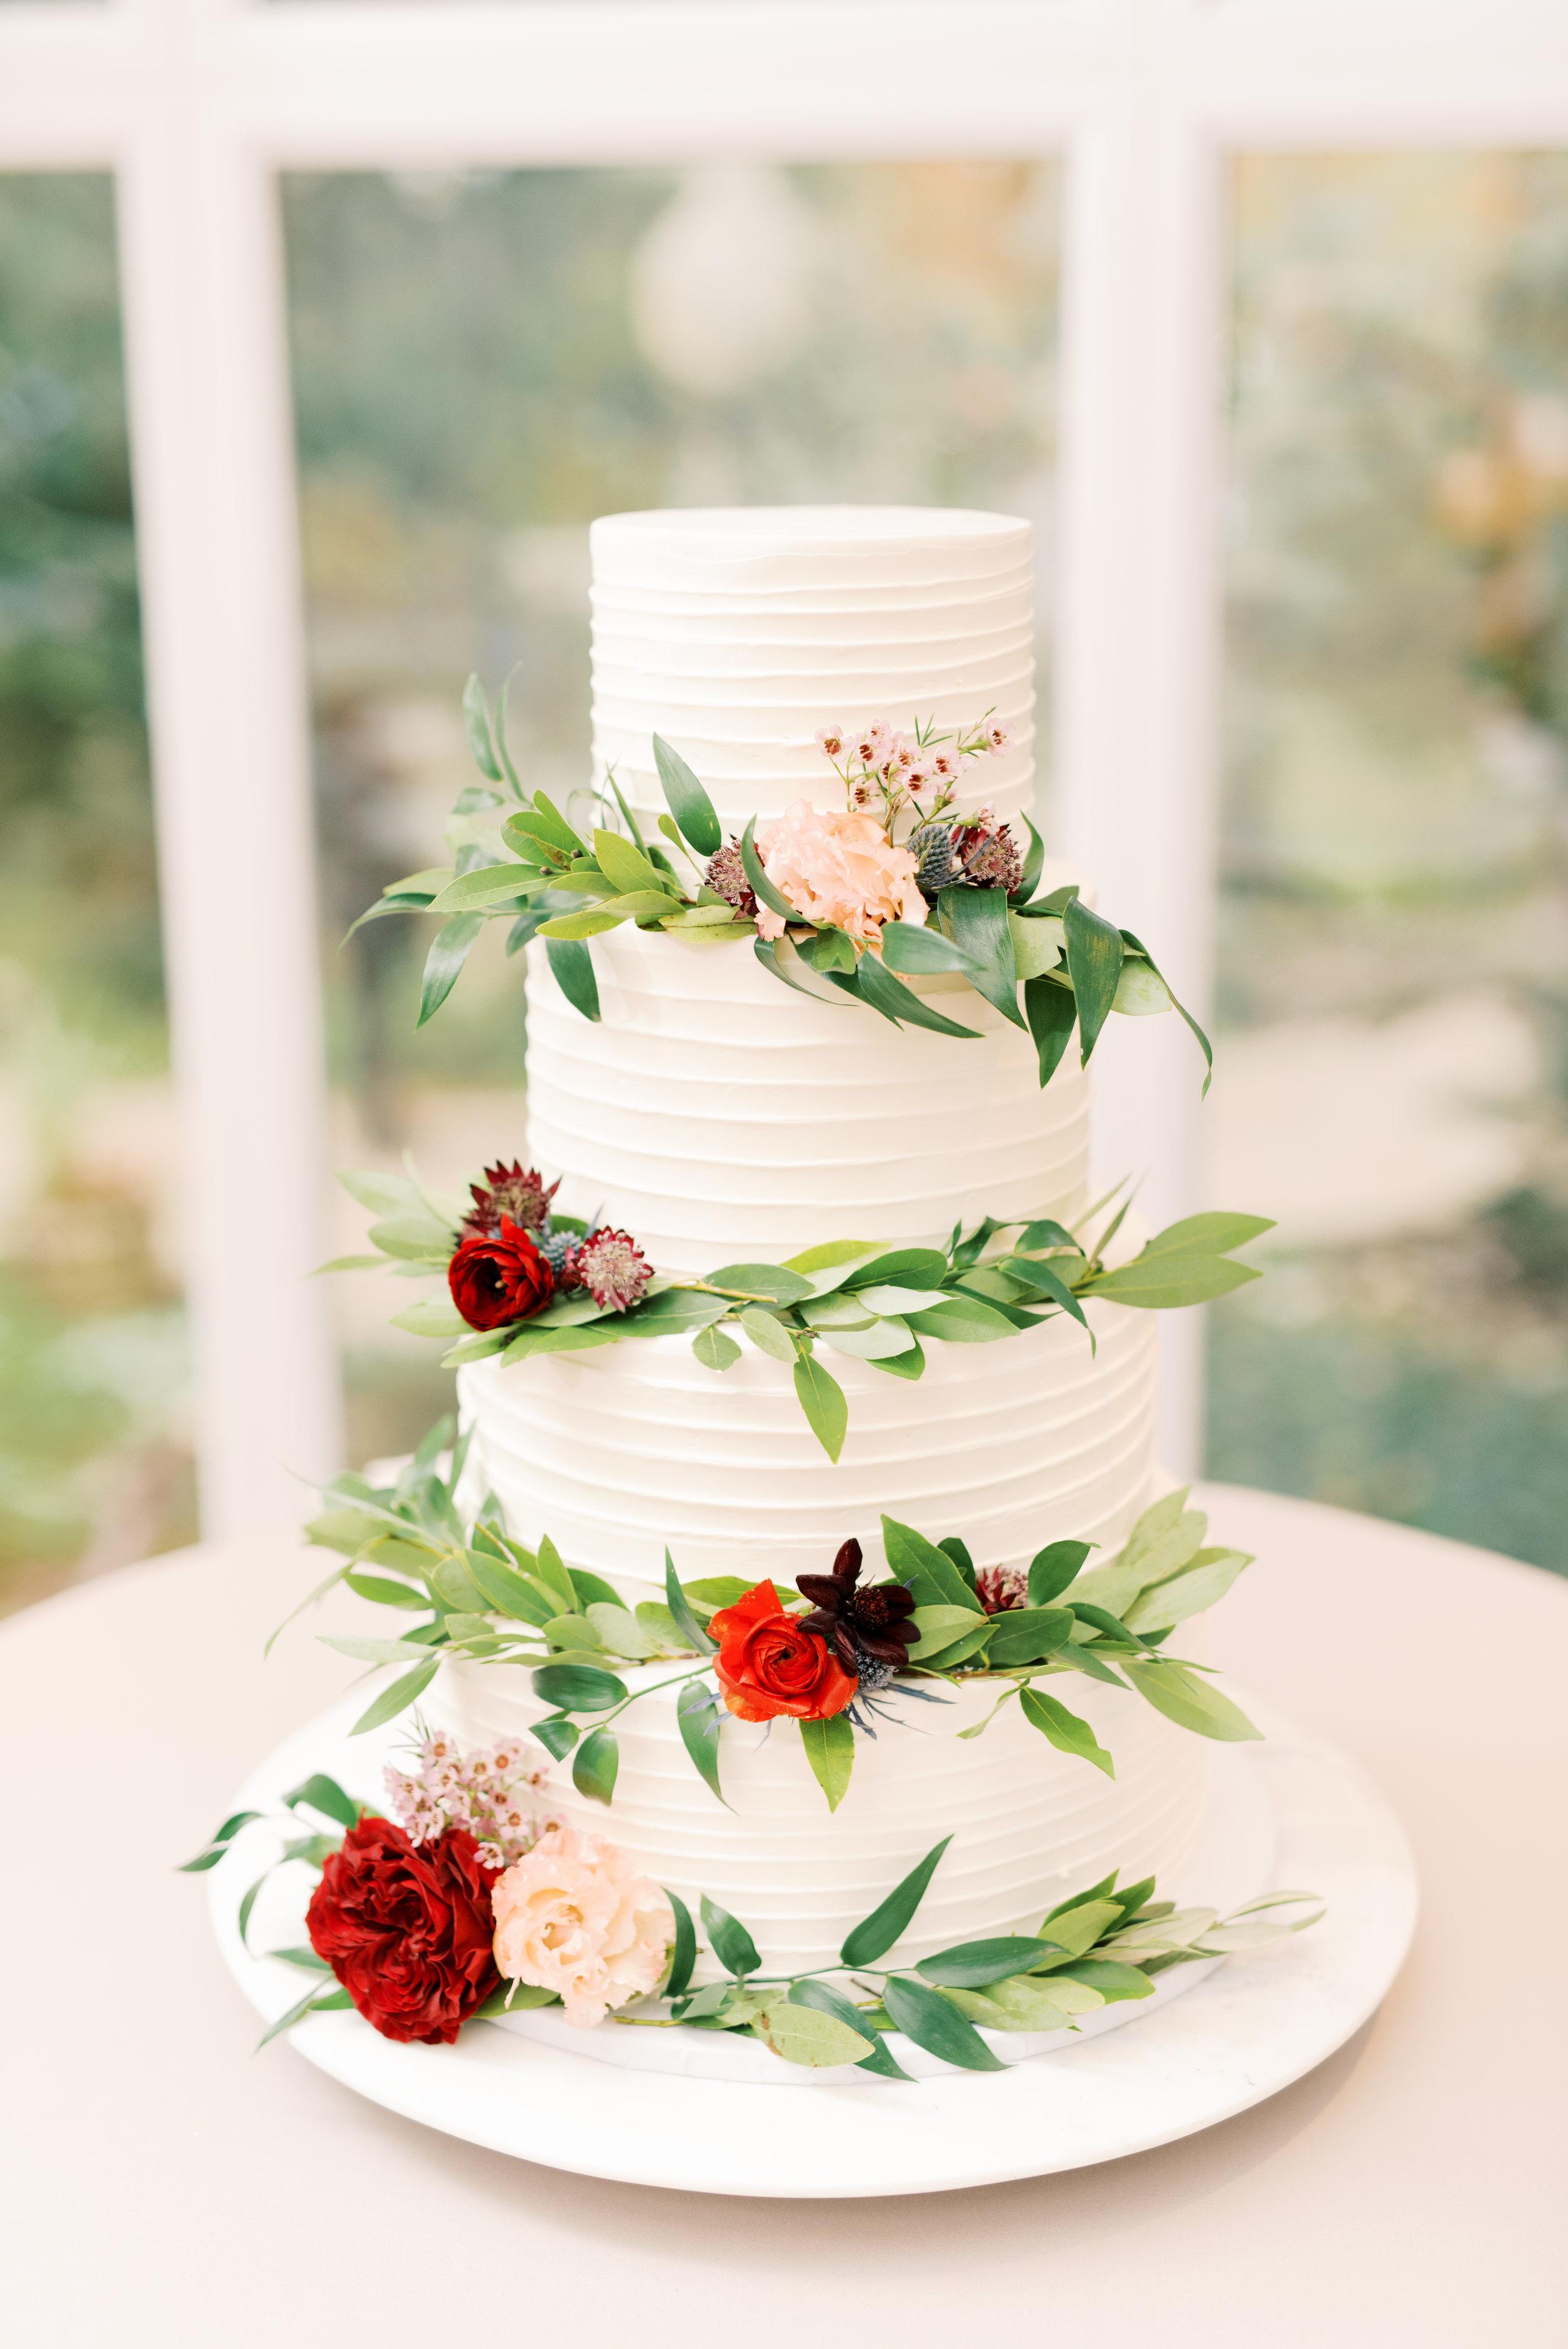 haley-richter-photography-october-pomme-wedding-in-radnor-073.jpg